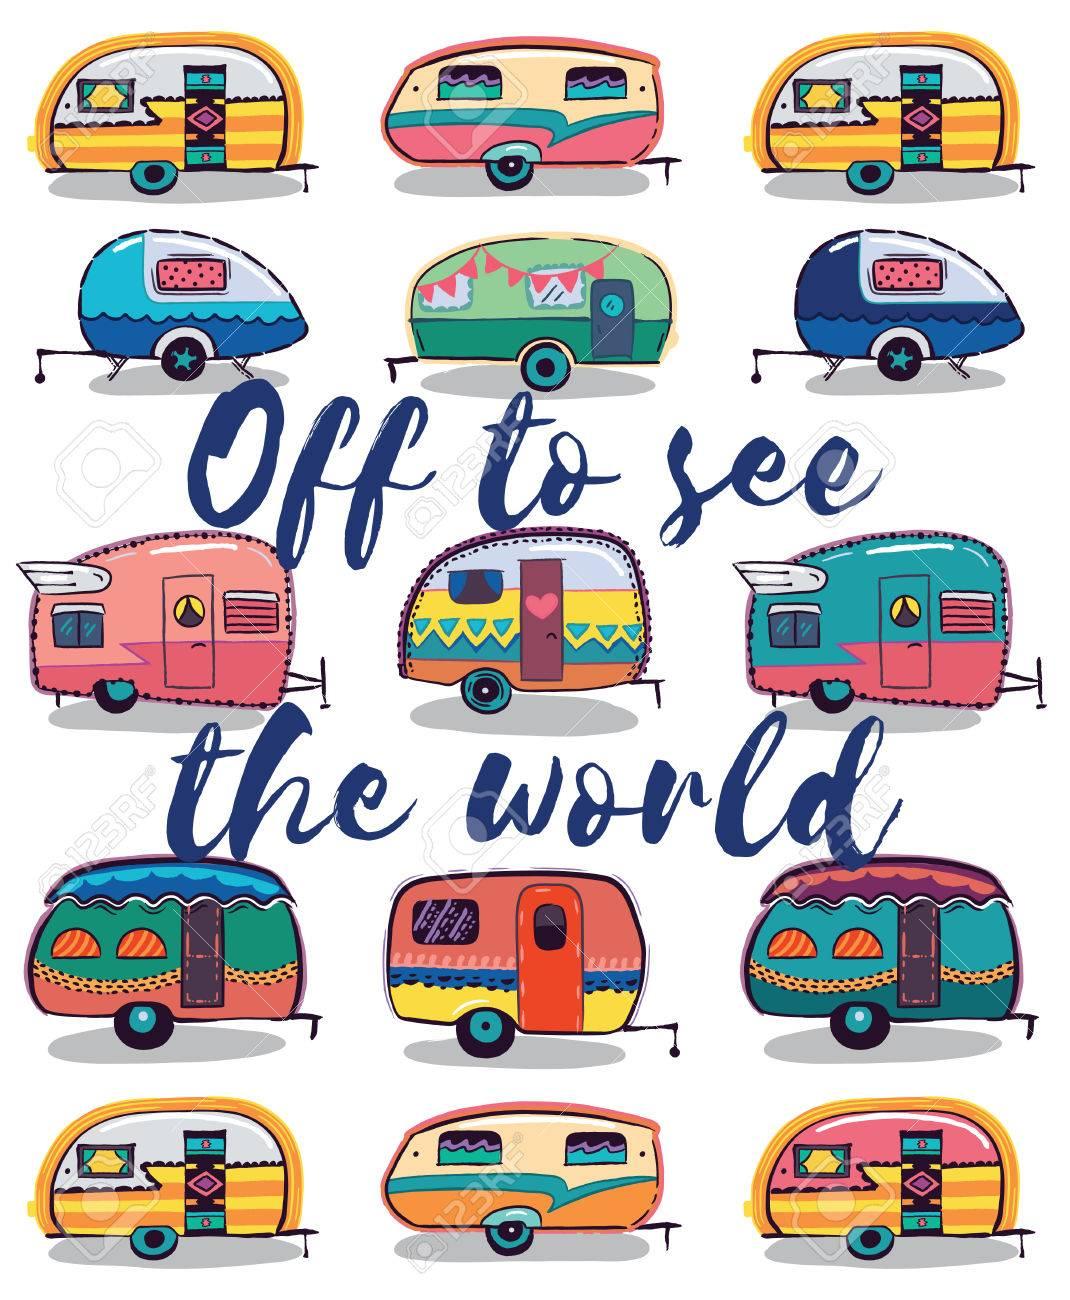 Retro Camper Fun. Happy Camper Card. Camping Travels Greeting Card. Cute little vintage travel trailers caravan. Vector illustration - 56645270